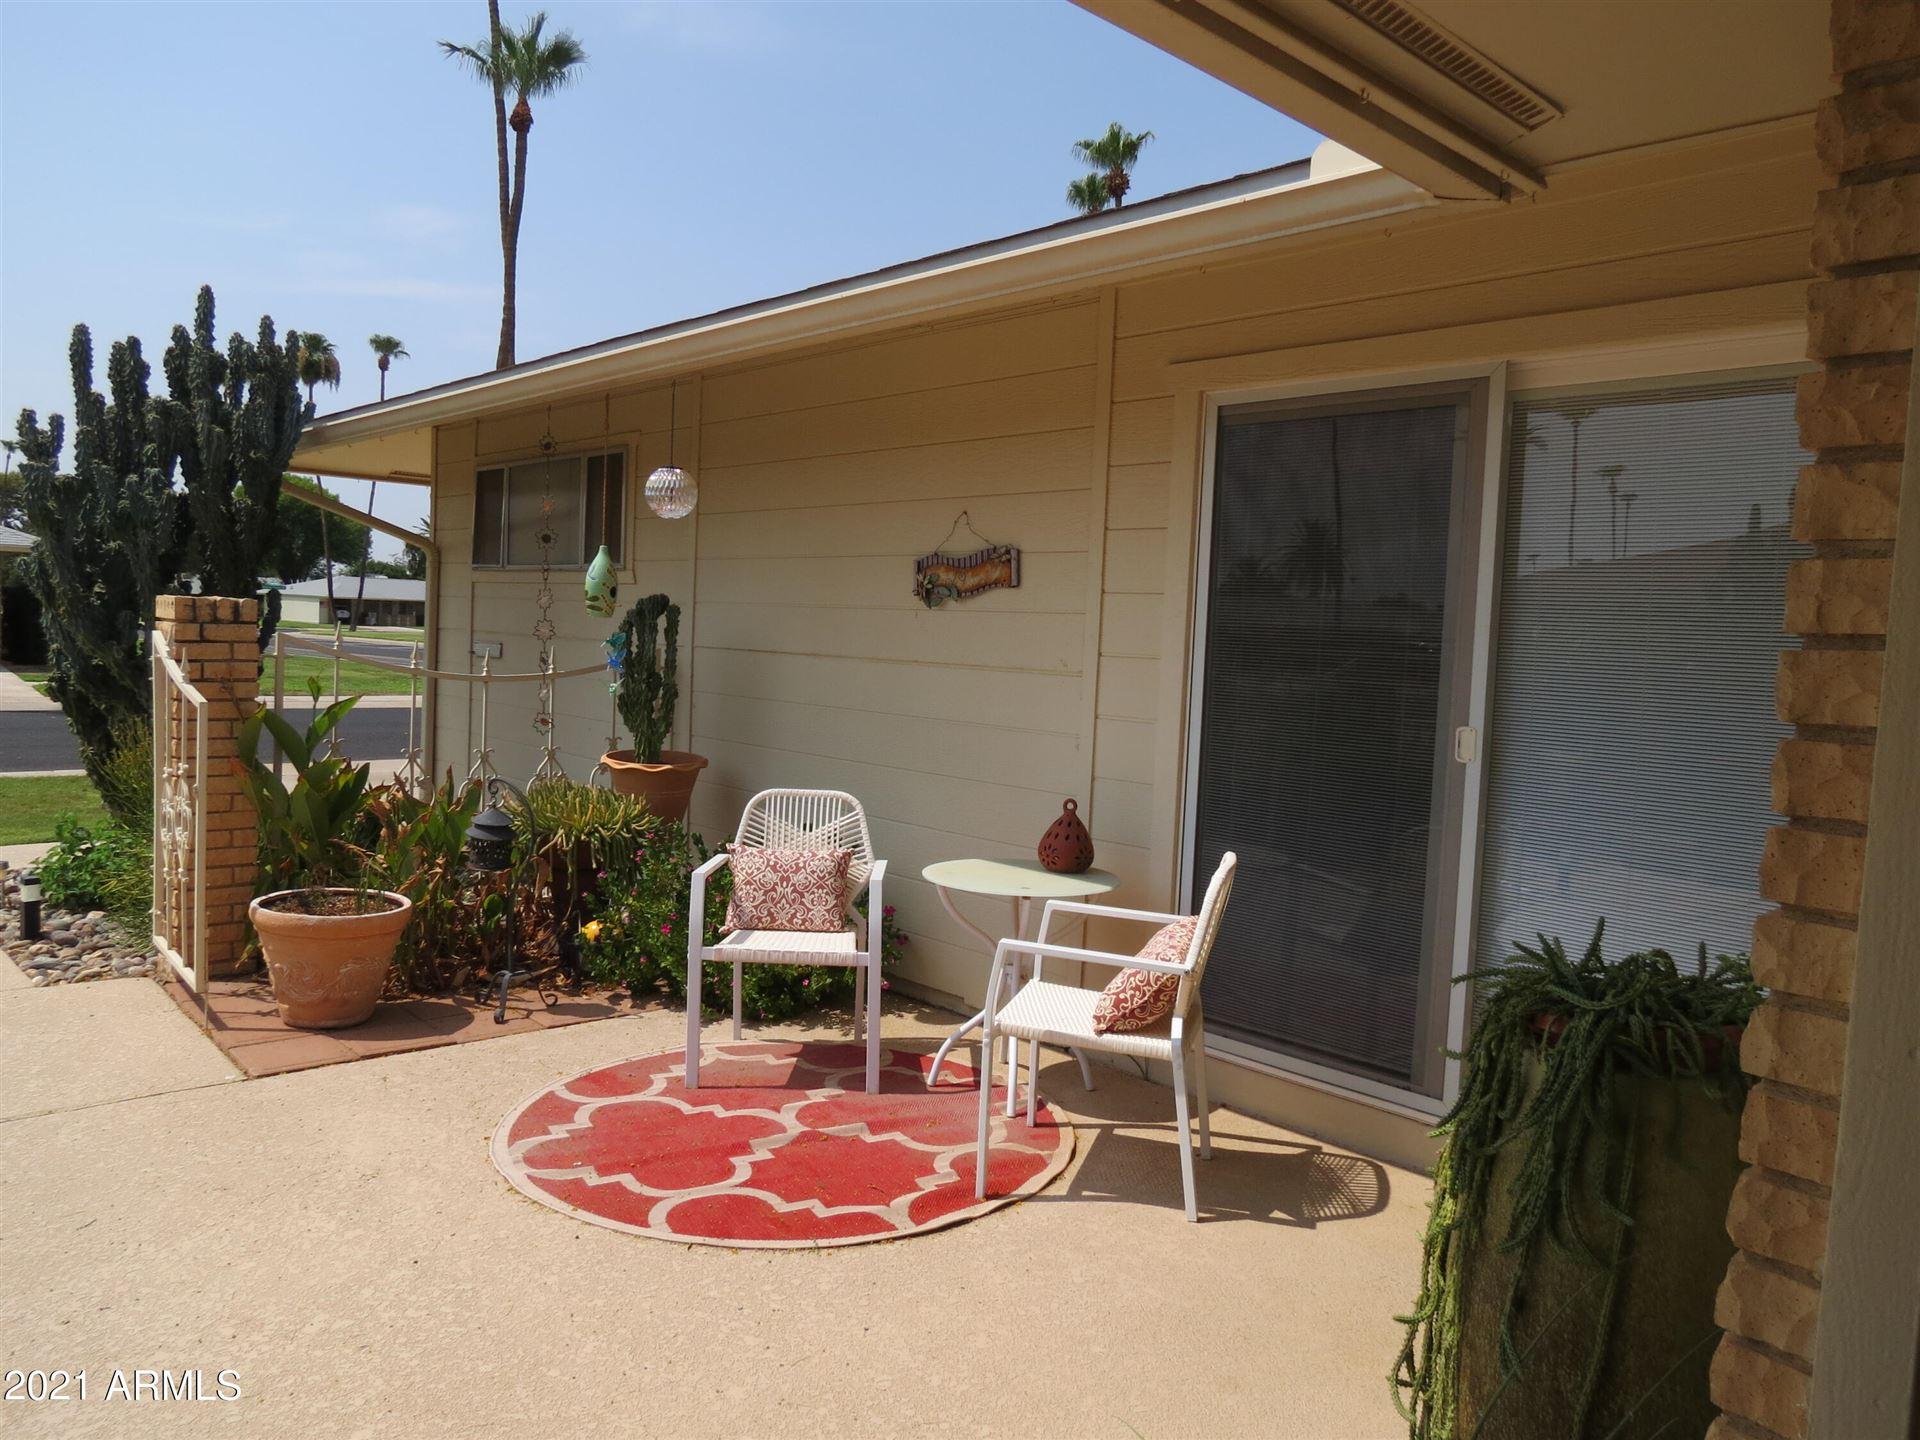 Photo of 10352 W KINGSWOOD Circle, Sun City, AZ 85351 (MLS # 6268759)